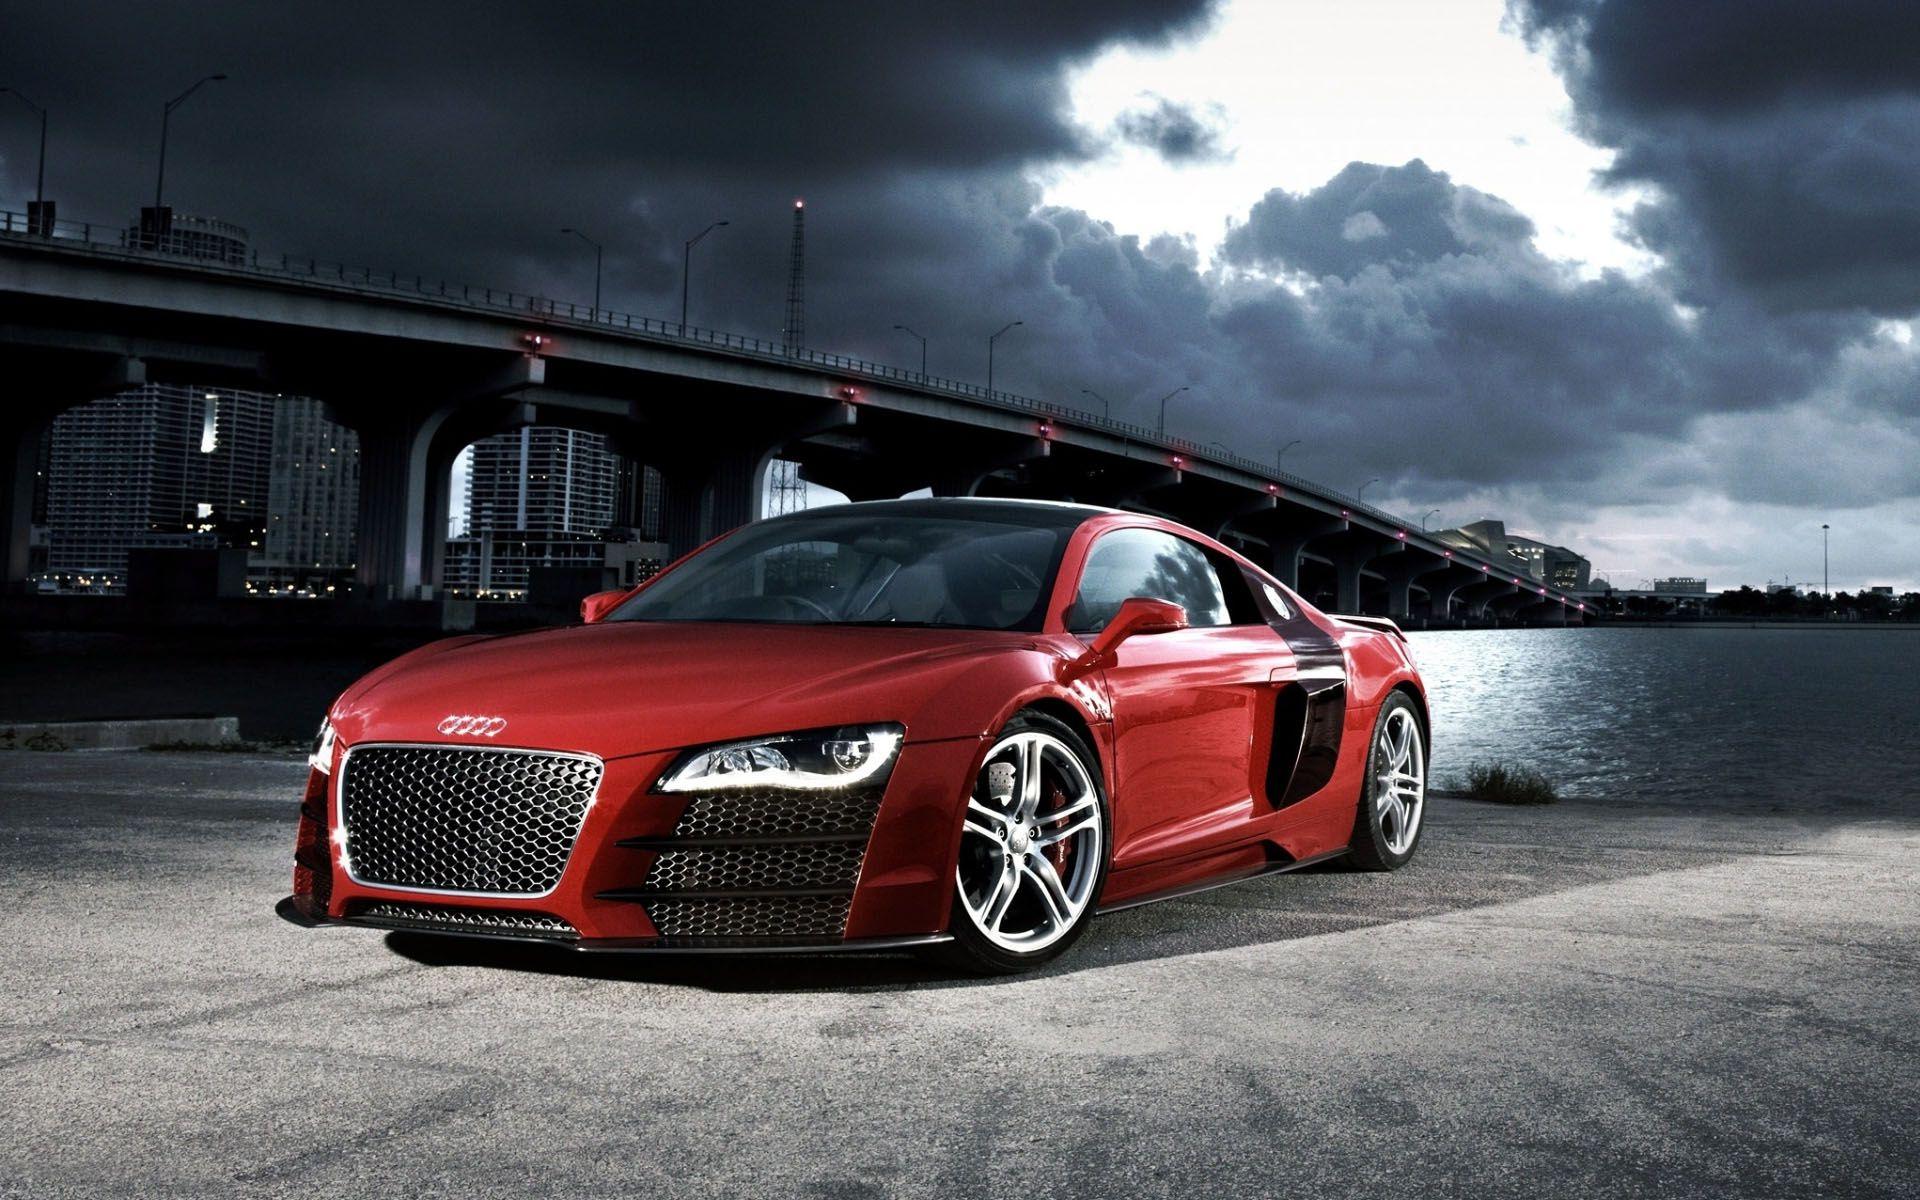 2015 Audi R8 Red Wallpaper Free Download Wallpaper From Wallpaperank Com Red Wallpaper Audi Audi R8